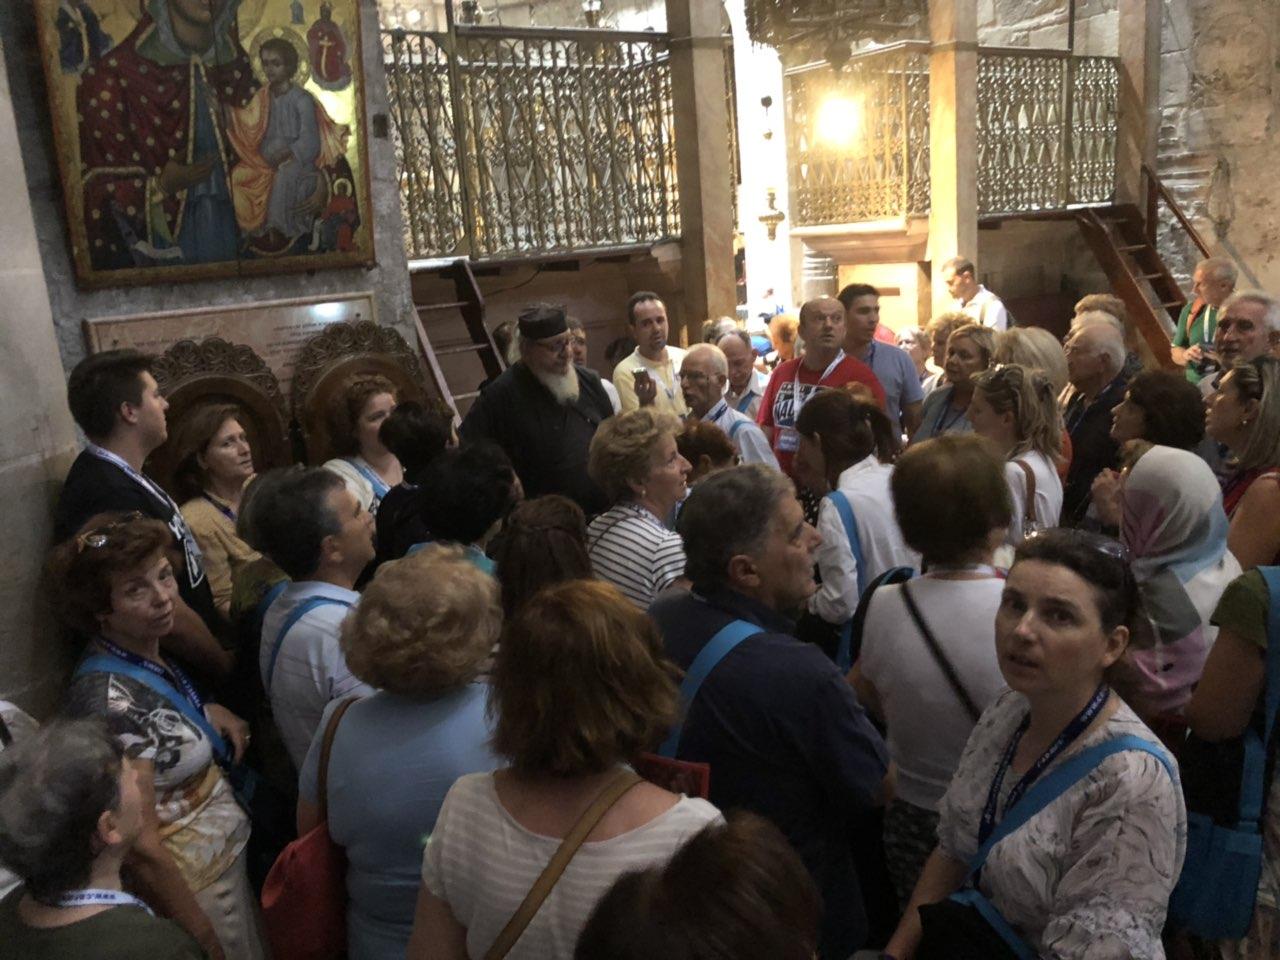 ierosolyma2019 7 - Λαρισαίοι Προσκυνητές Στην Αγία Γη Των Ιεροσολύμων (φωτο)